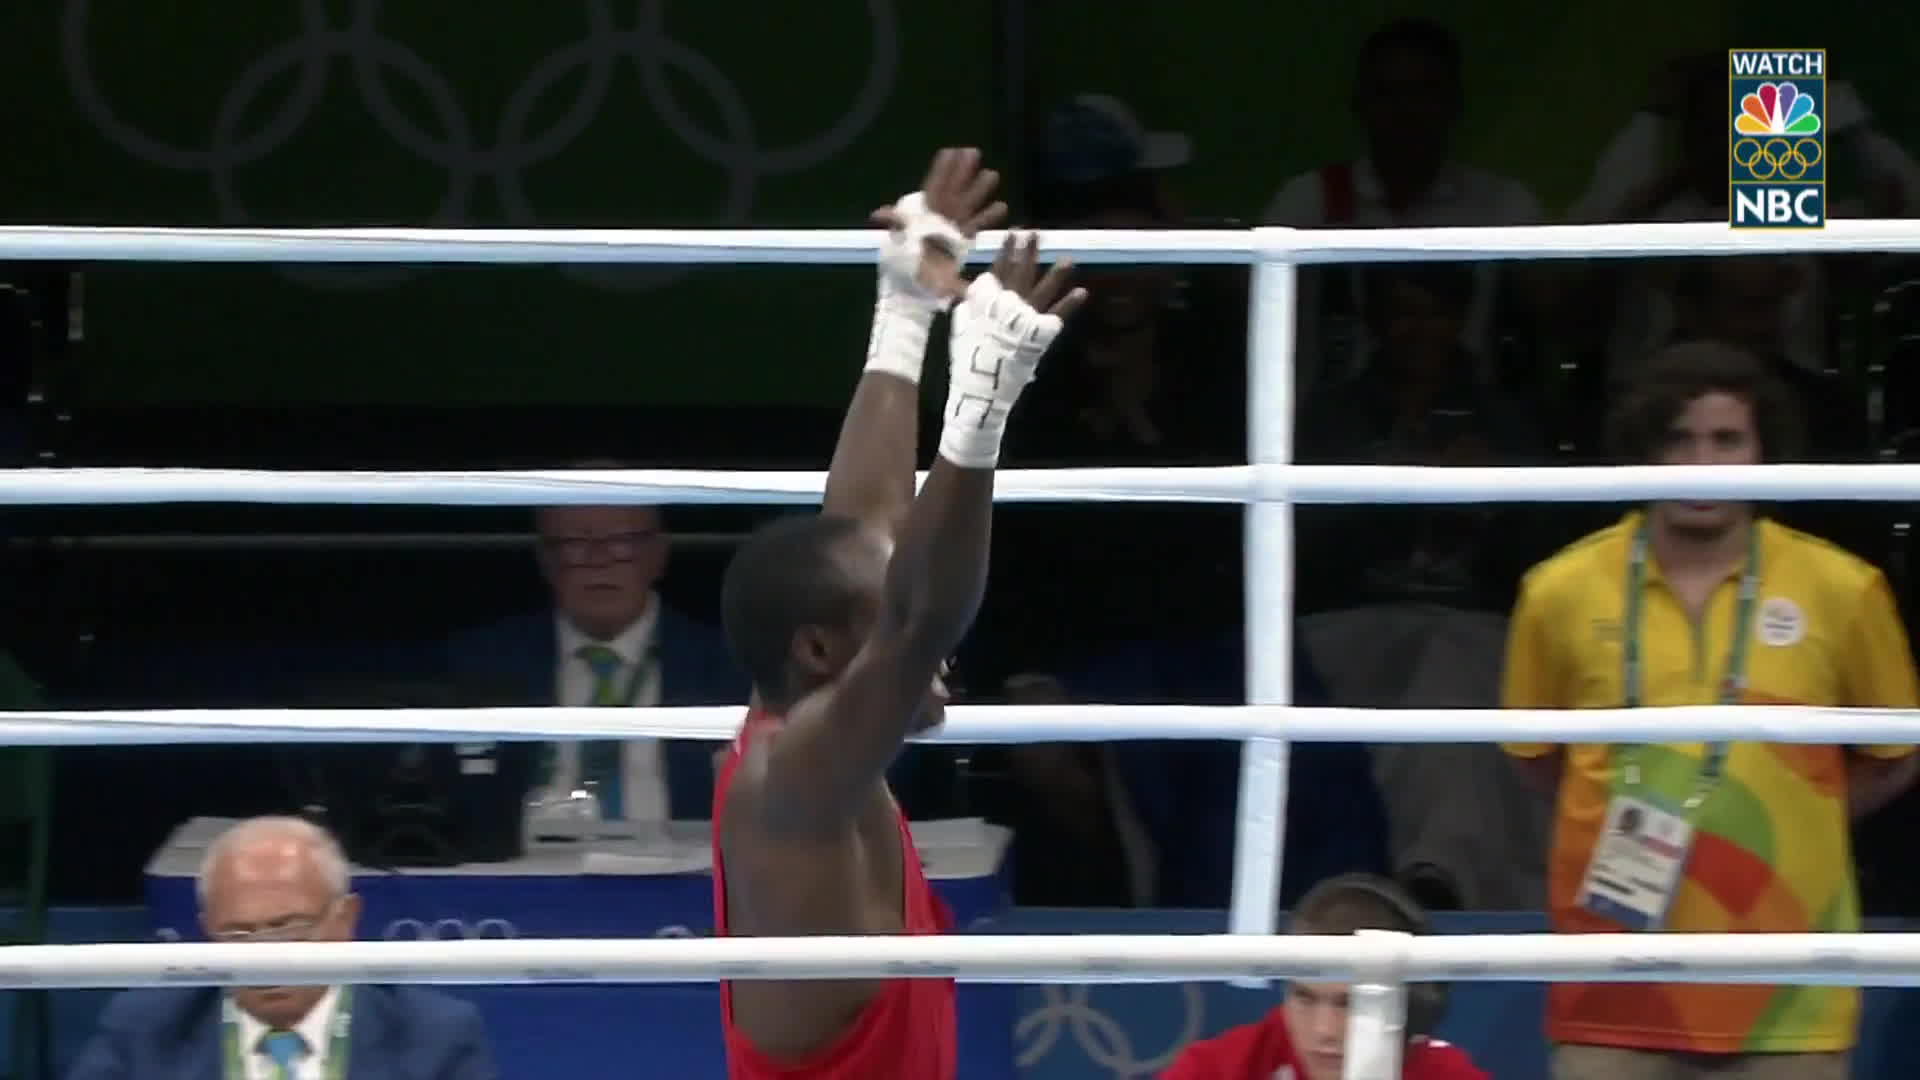 boxing, kenya, olymgifs, Kenya boxing's Warui and coaches nail dance celebration GIFs